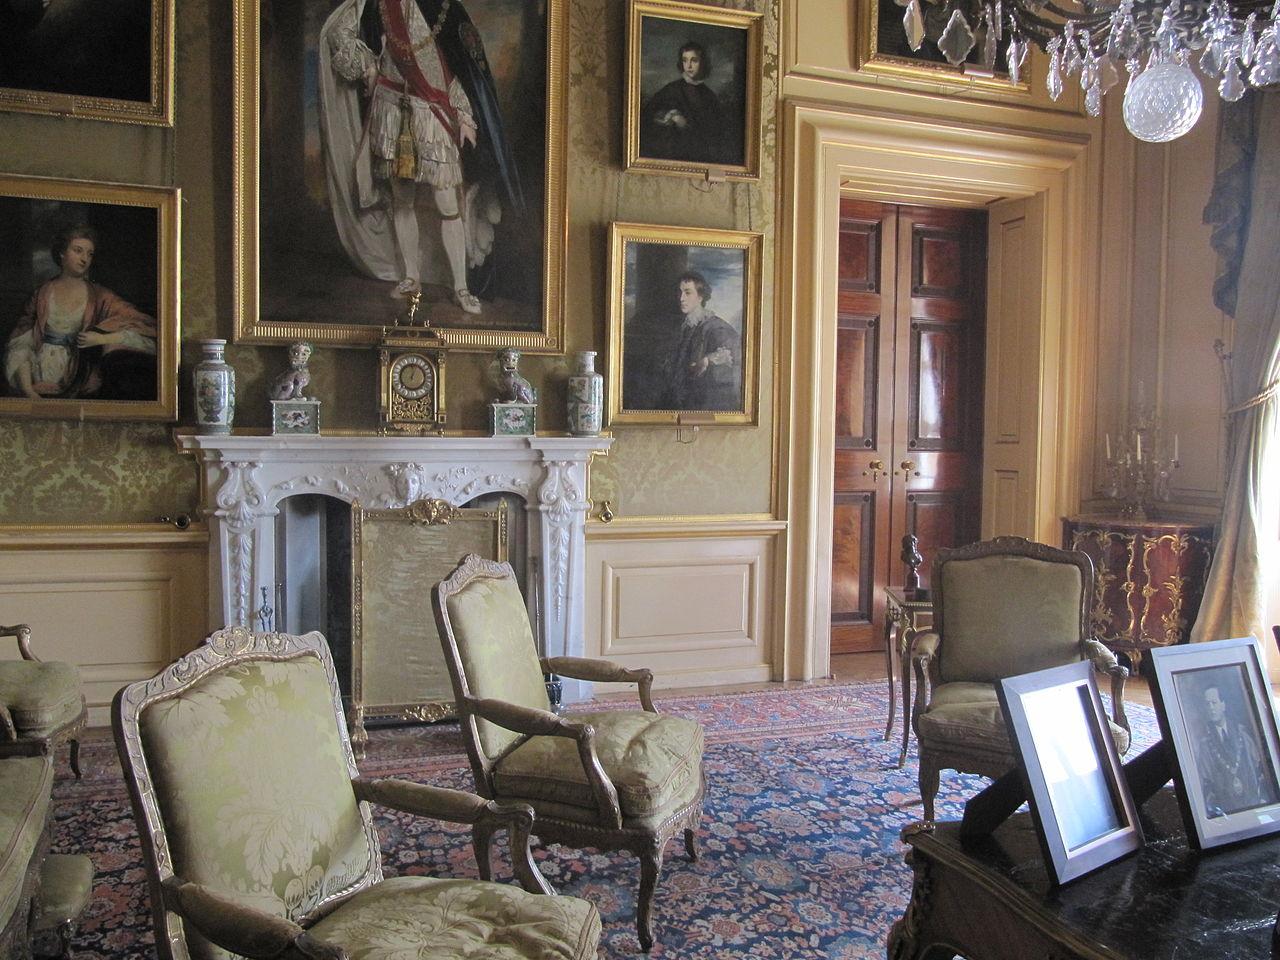 palace blenheim interior file wikipedia commons wikimedia history pixels